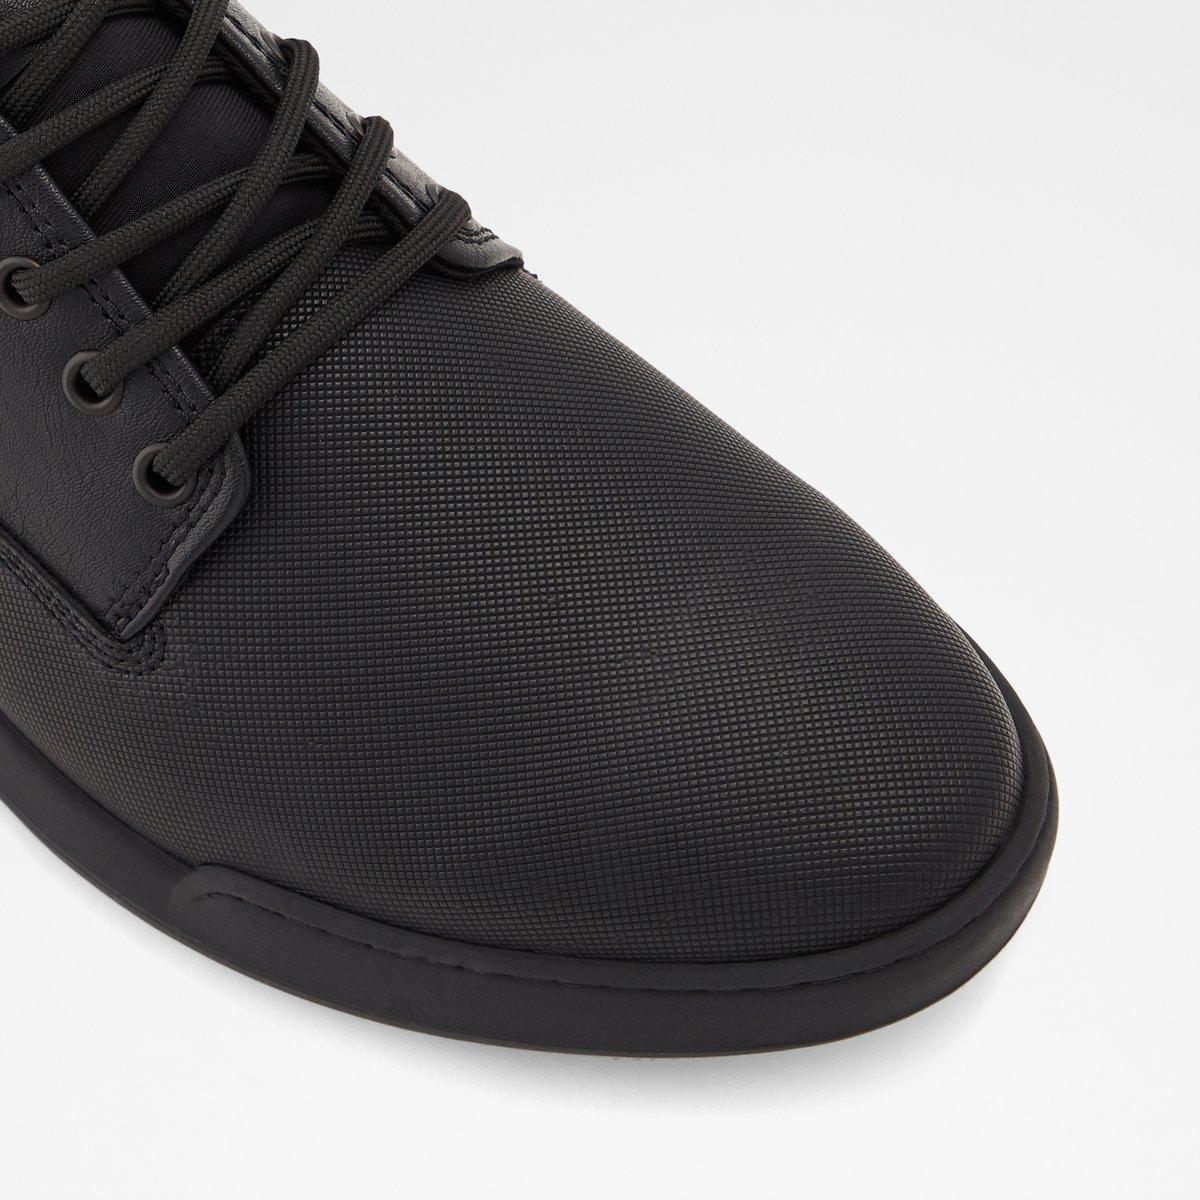 Adraleven Black Men's Sneakers | ALDO US